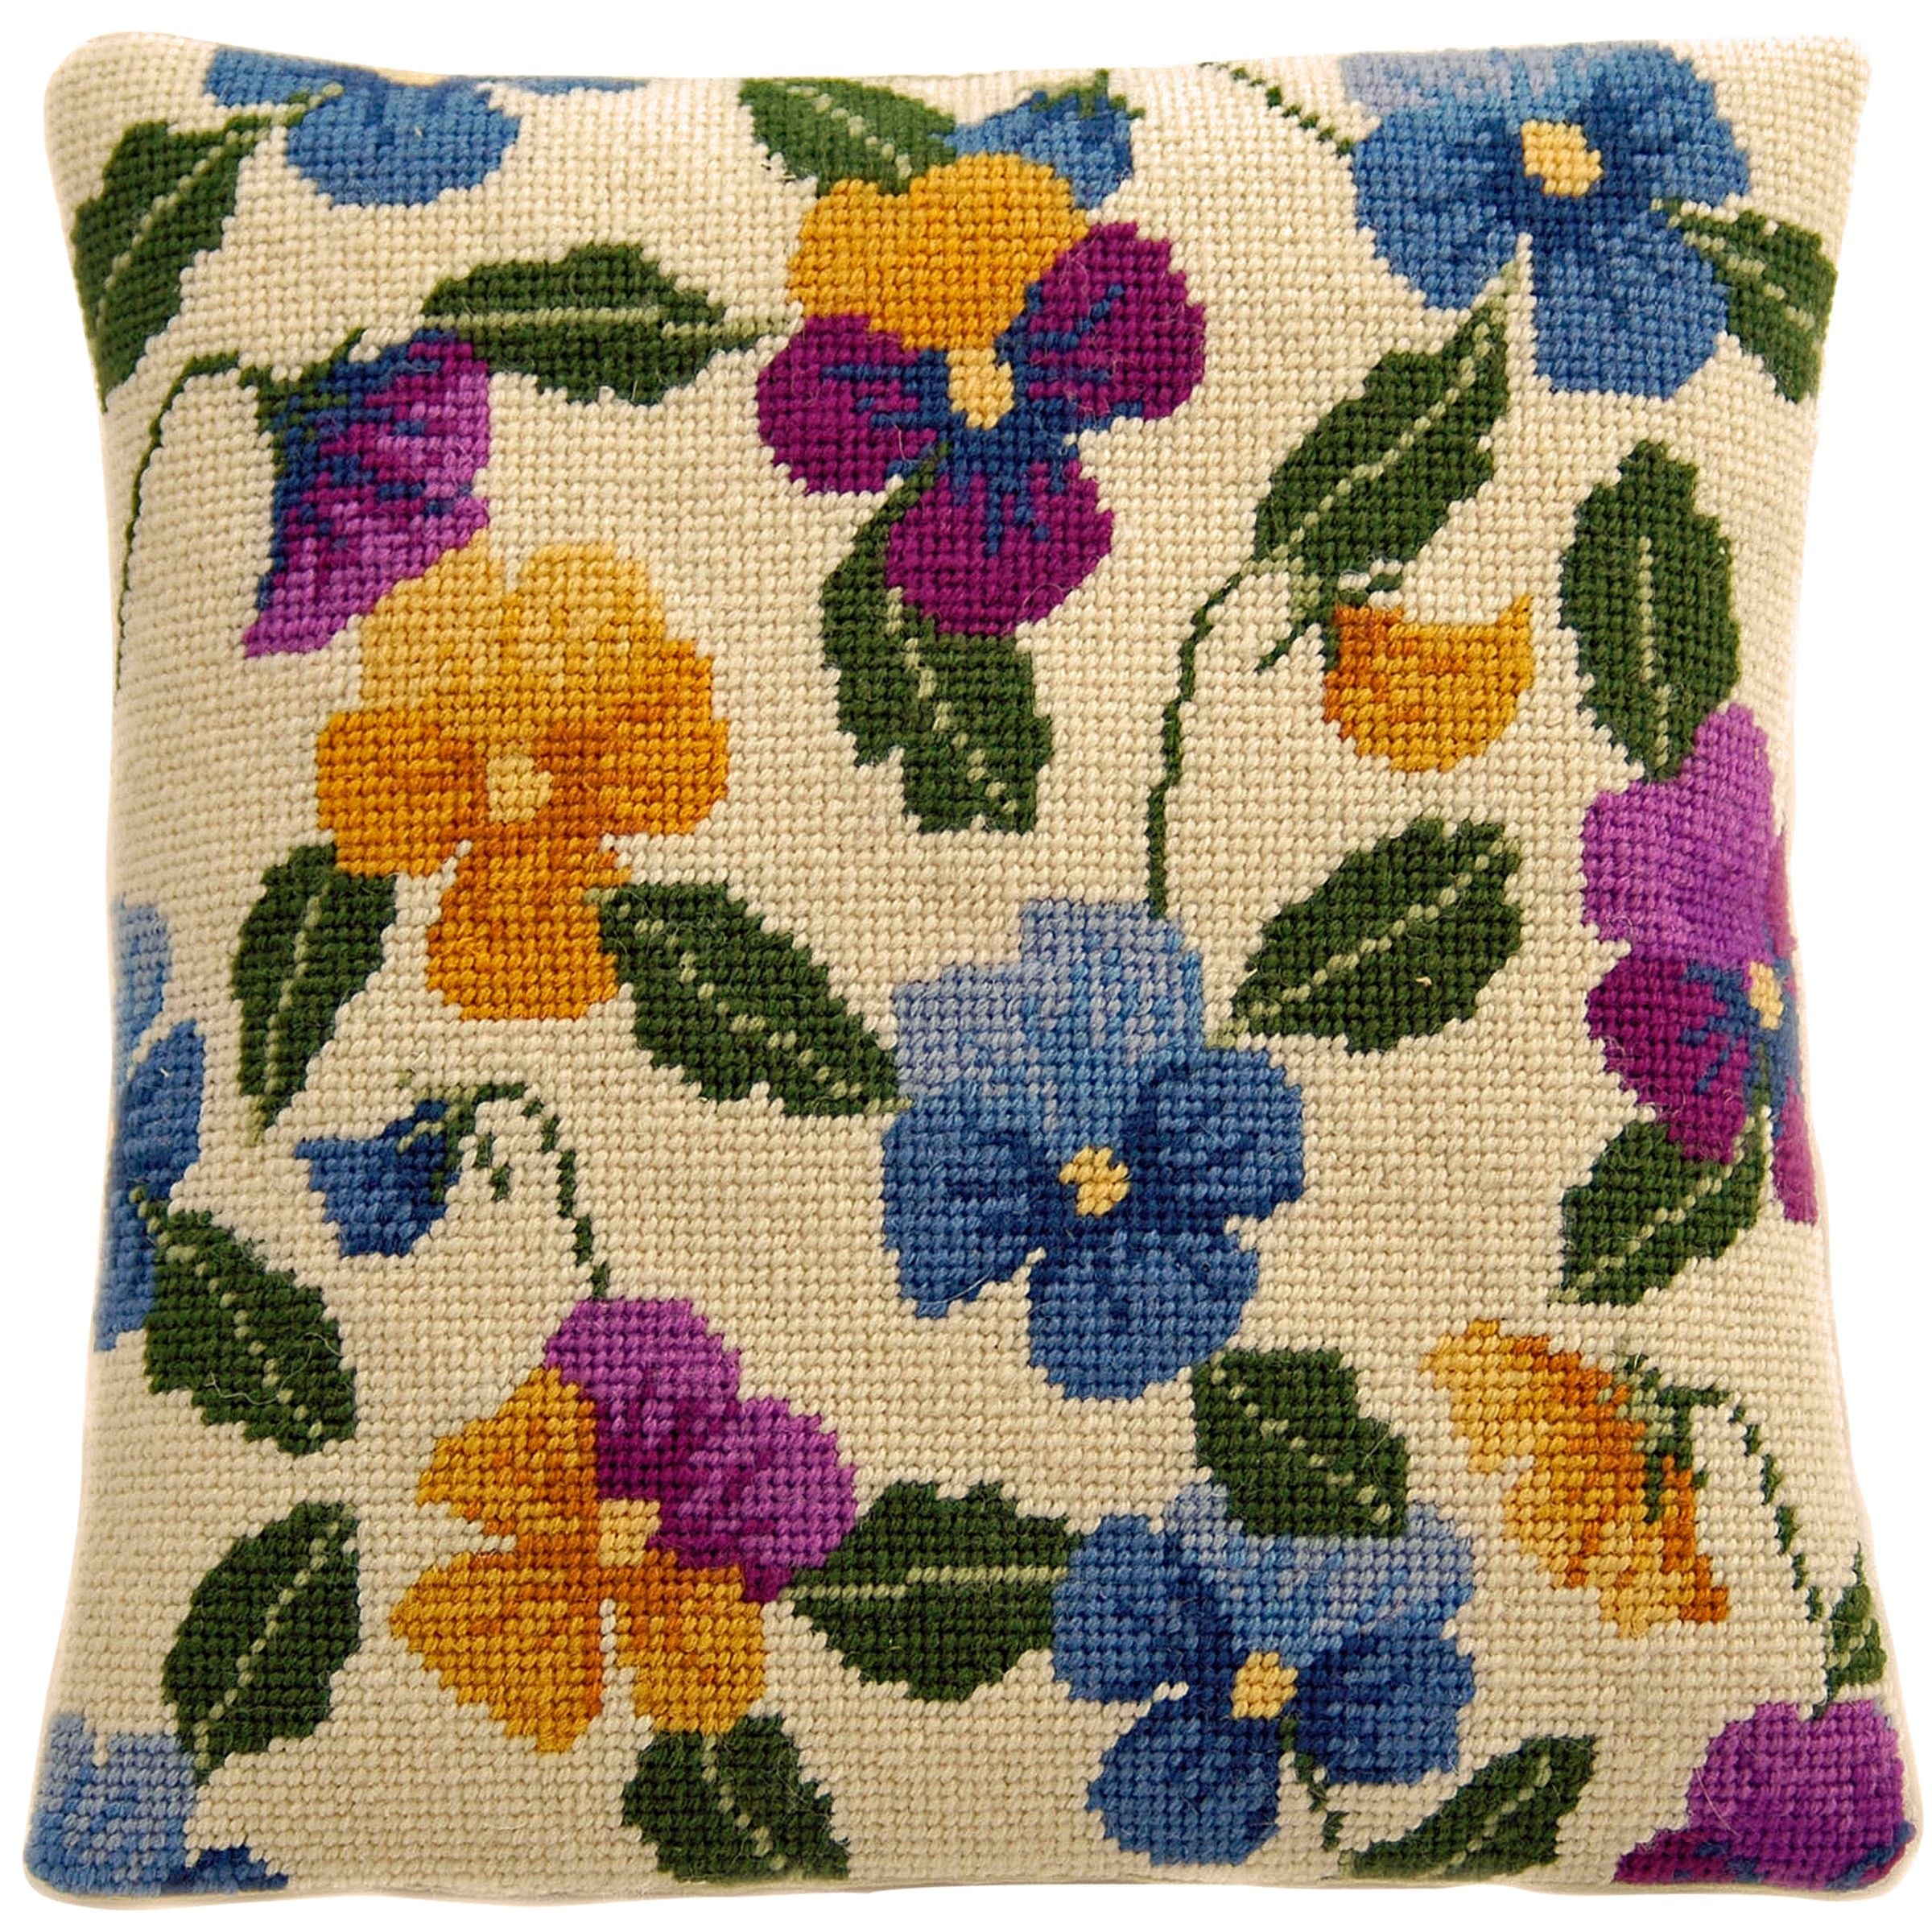 Cleopatra's Needle Cleopatra's Needle Pansy Pillow Tapestry Kit